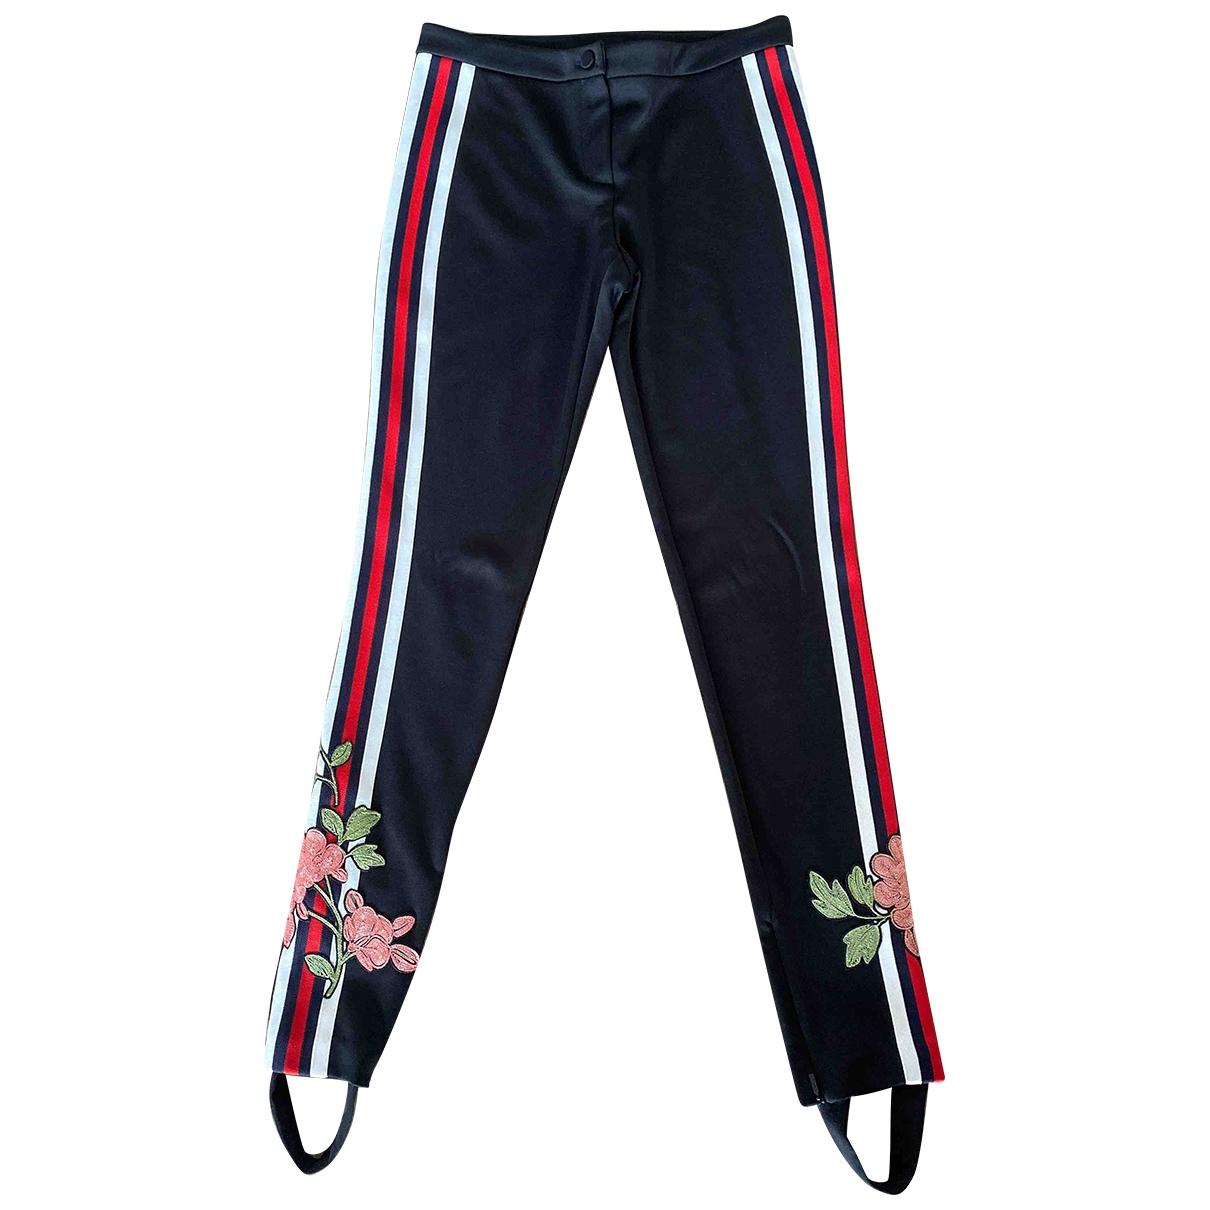 Gucci \N Black Trousers for Women S International